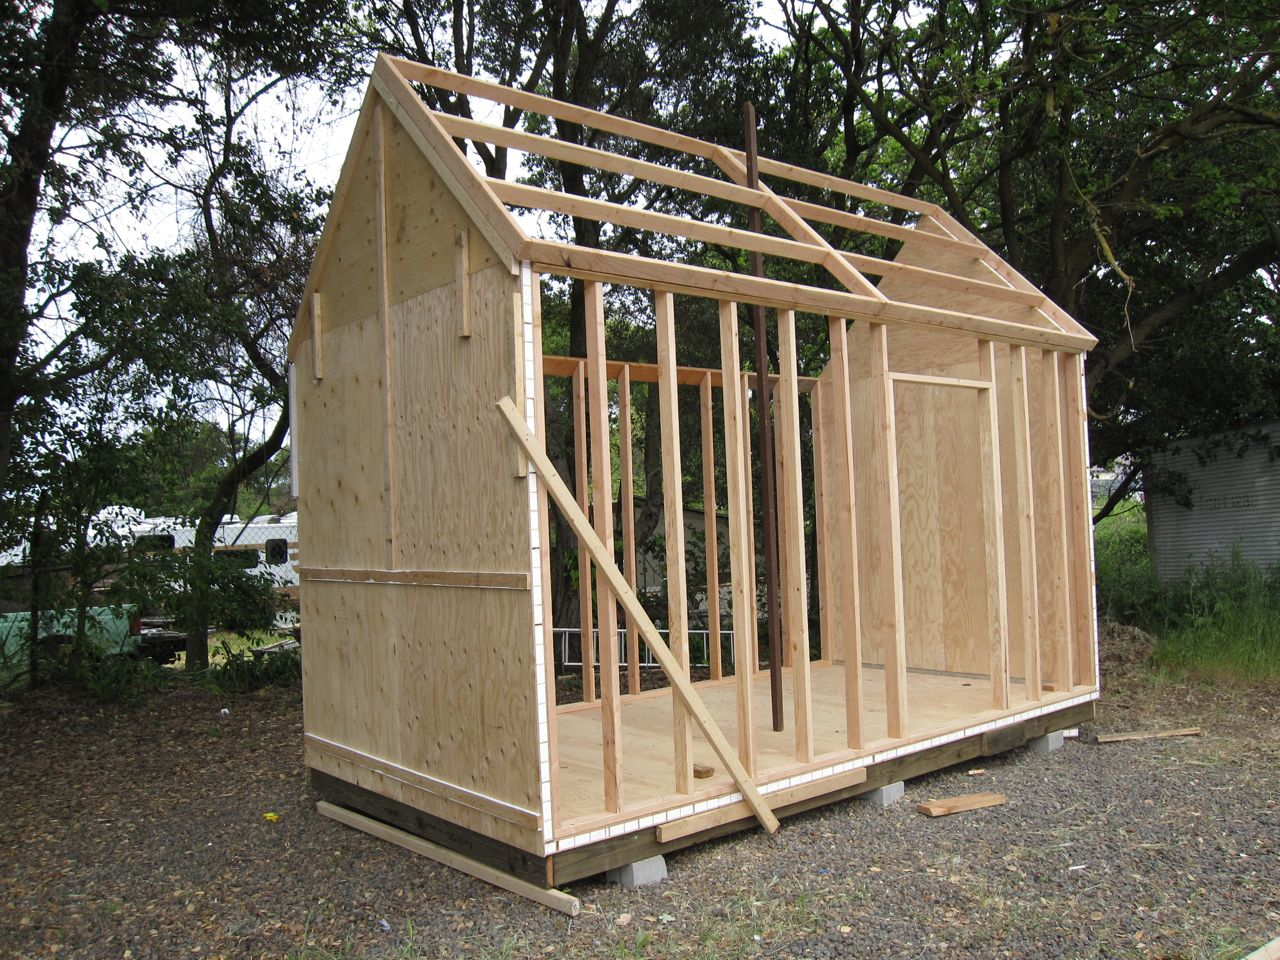 The Sonoma Shanty – Workshops, Kits, Plans, Tiny Houses